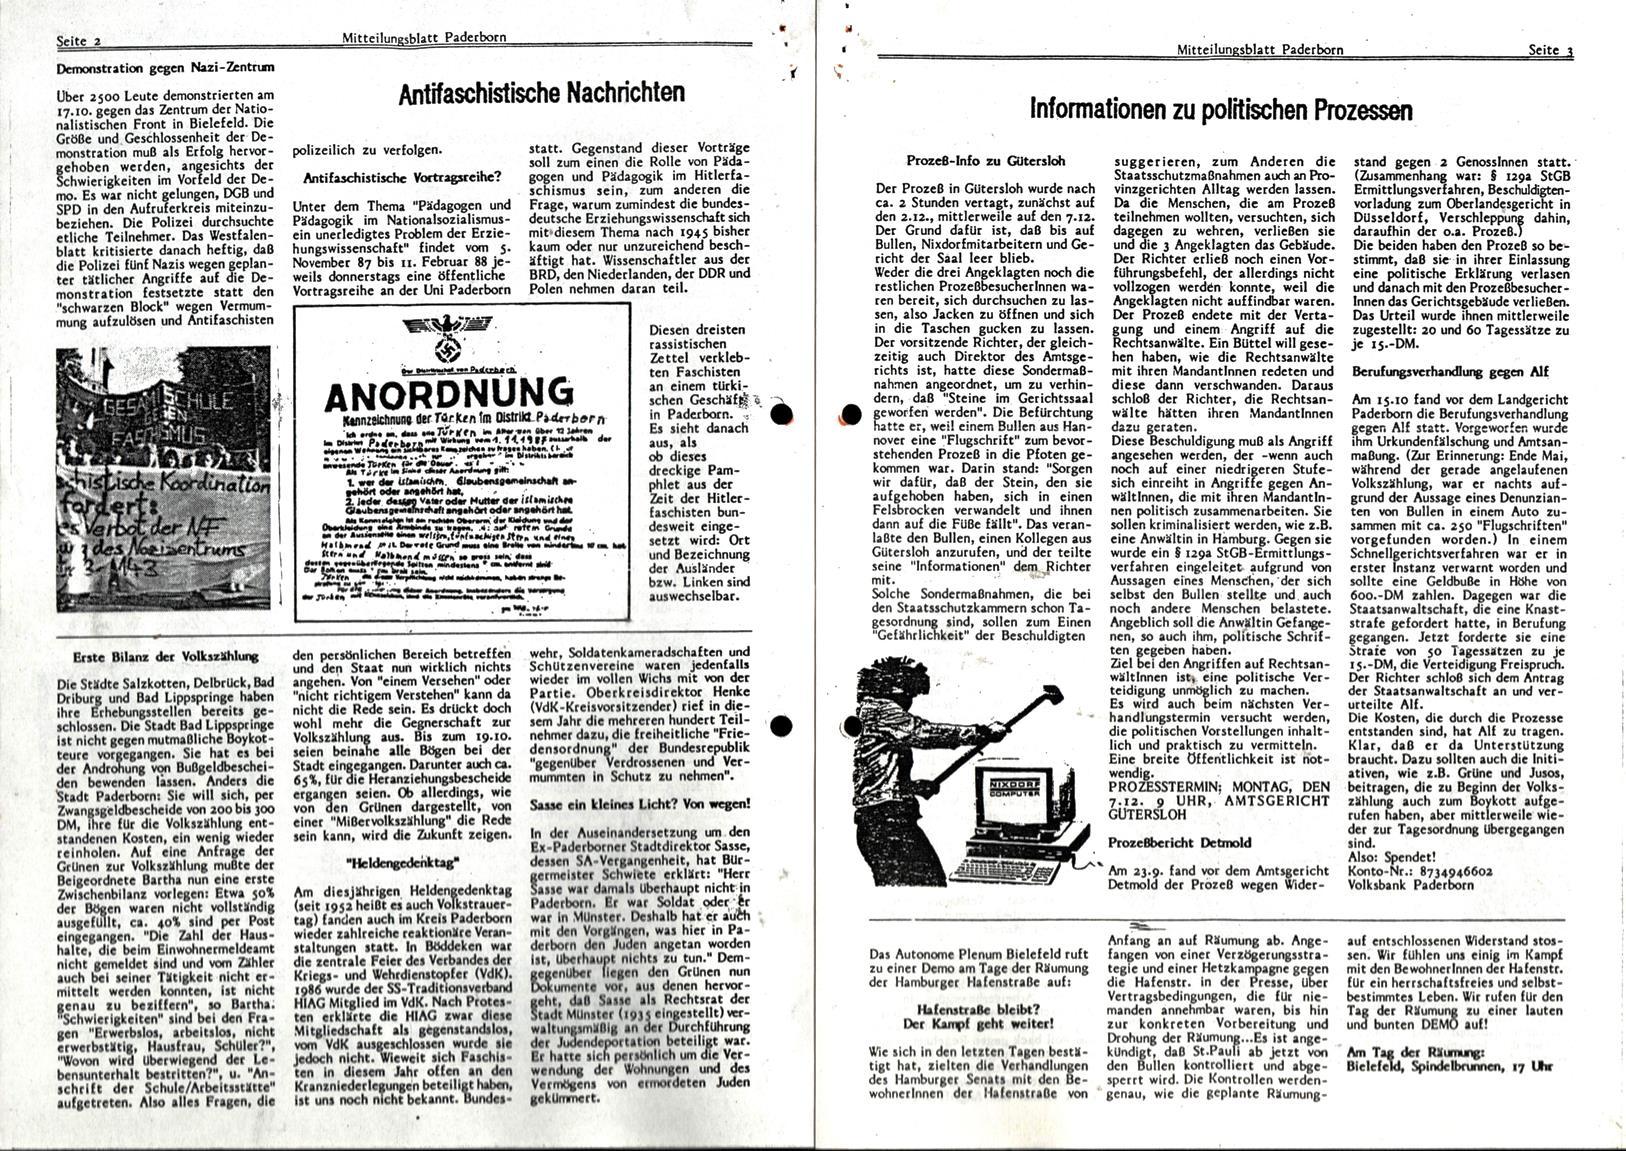 Paderborn_BWK_Mitteilungsblatt_19871116_002